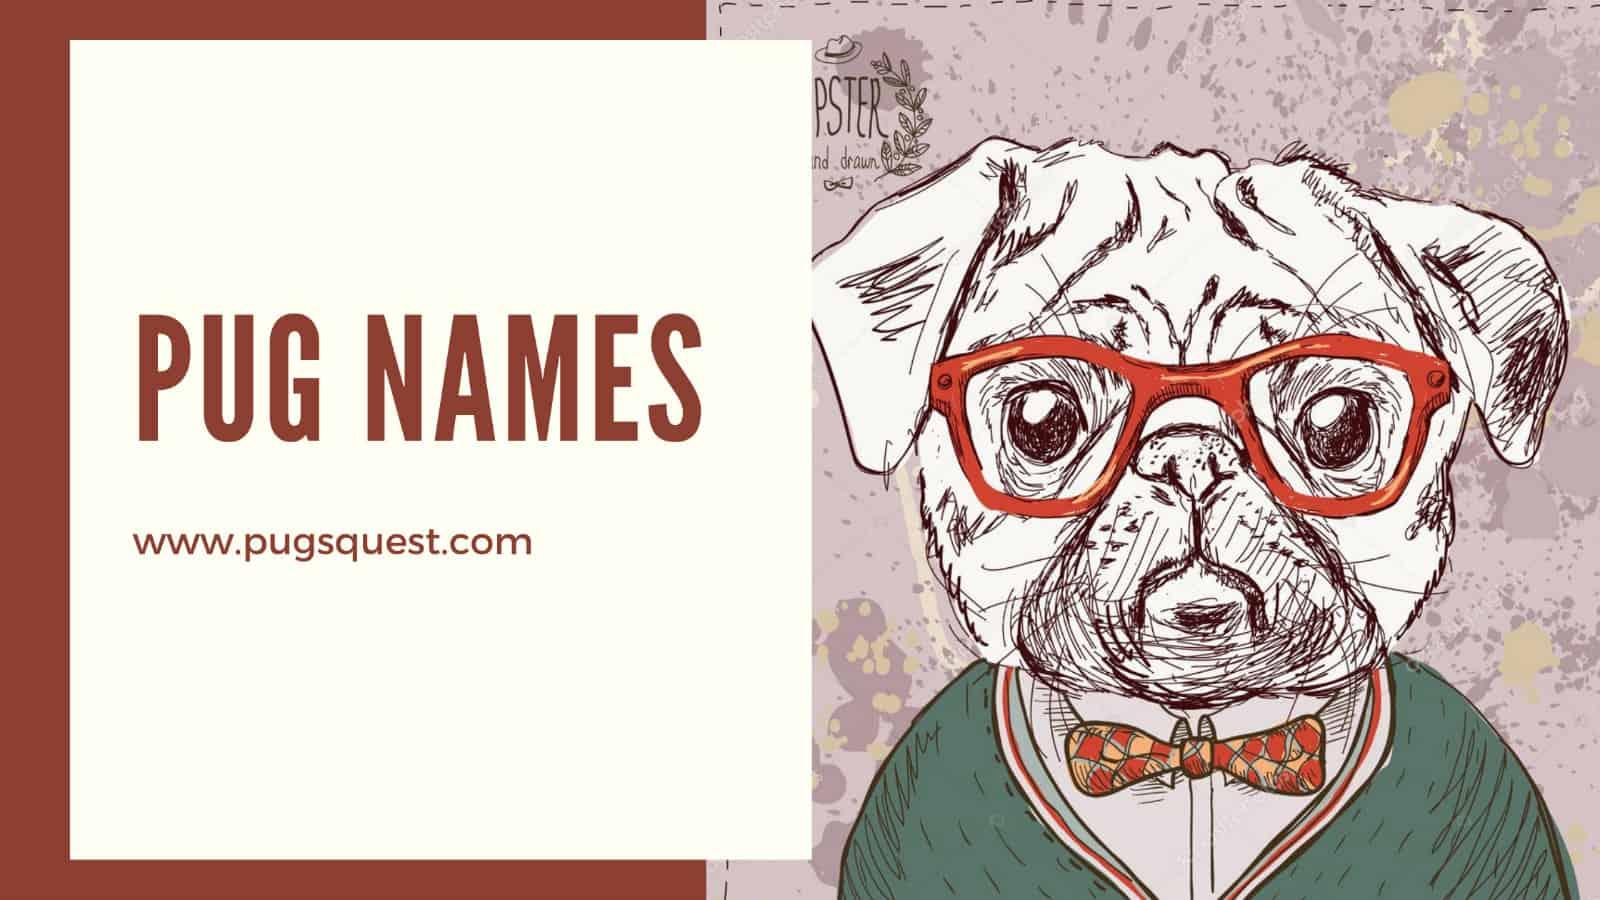 Pug names